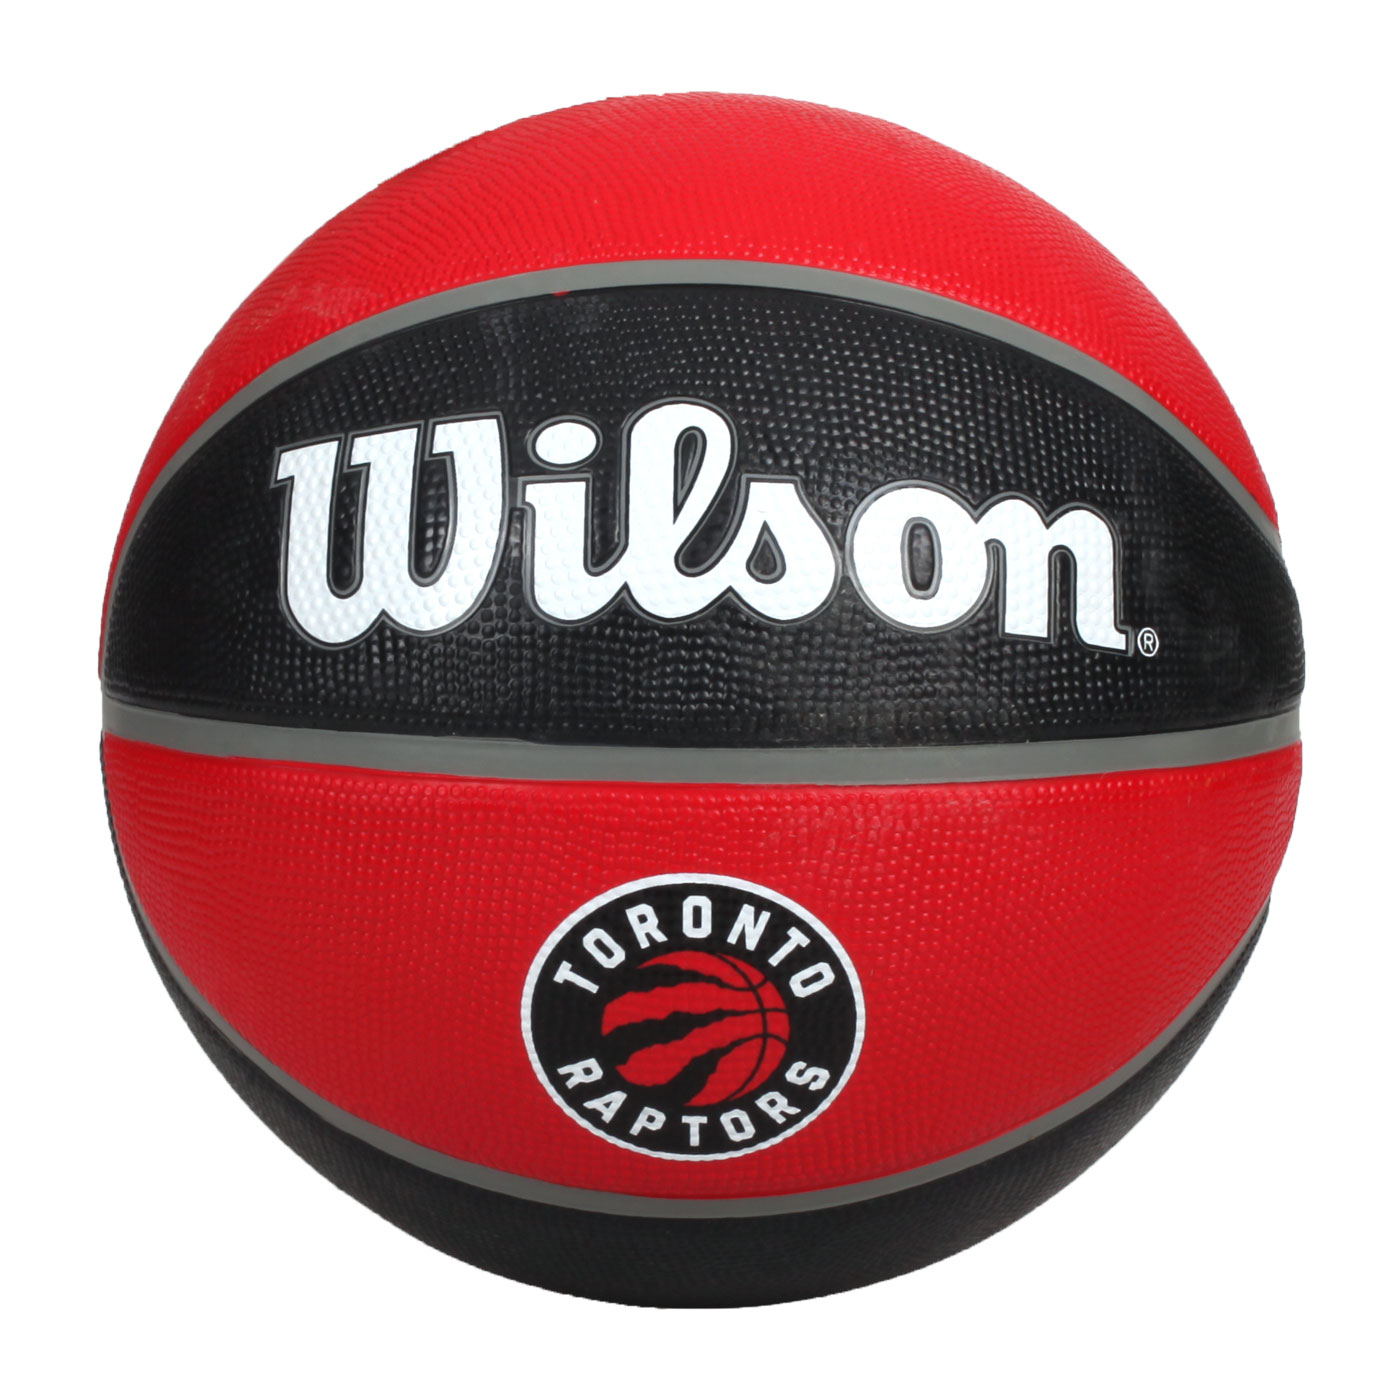 WILSON NBA隊徽系列 暴龍隊橡膠籃球#7 WTB1300XBTOR